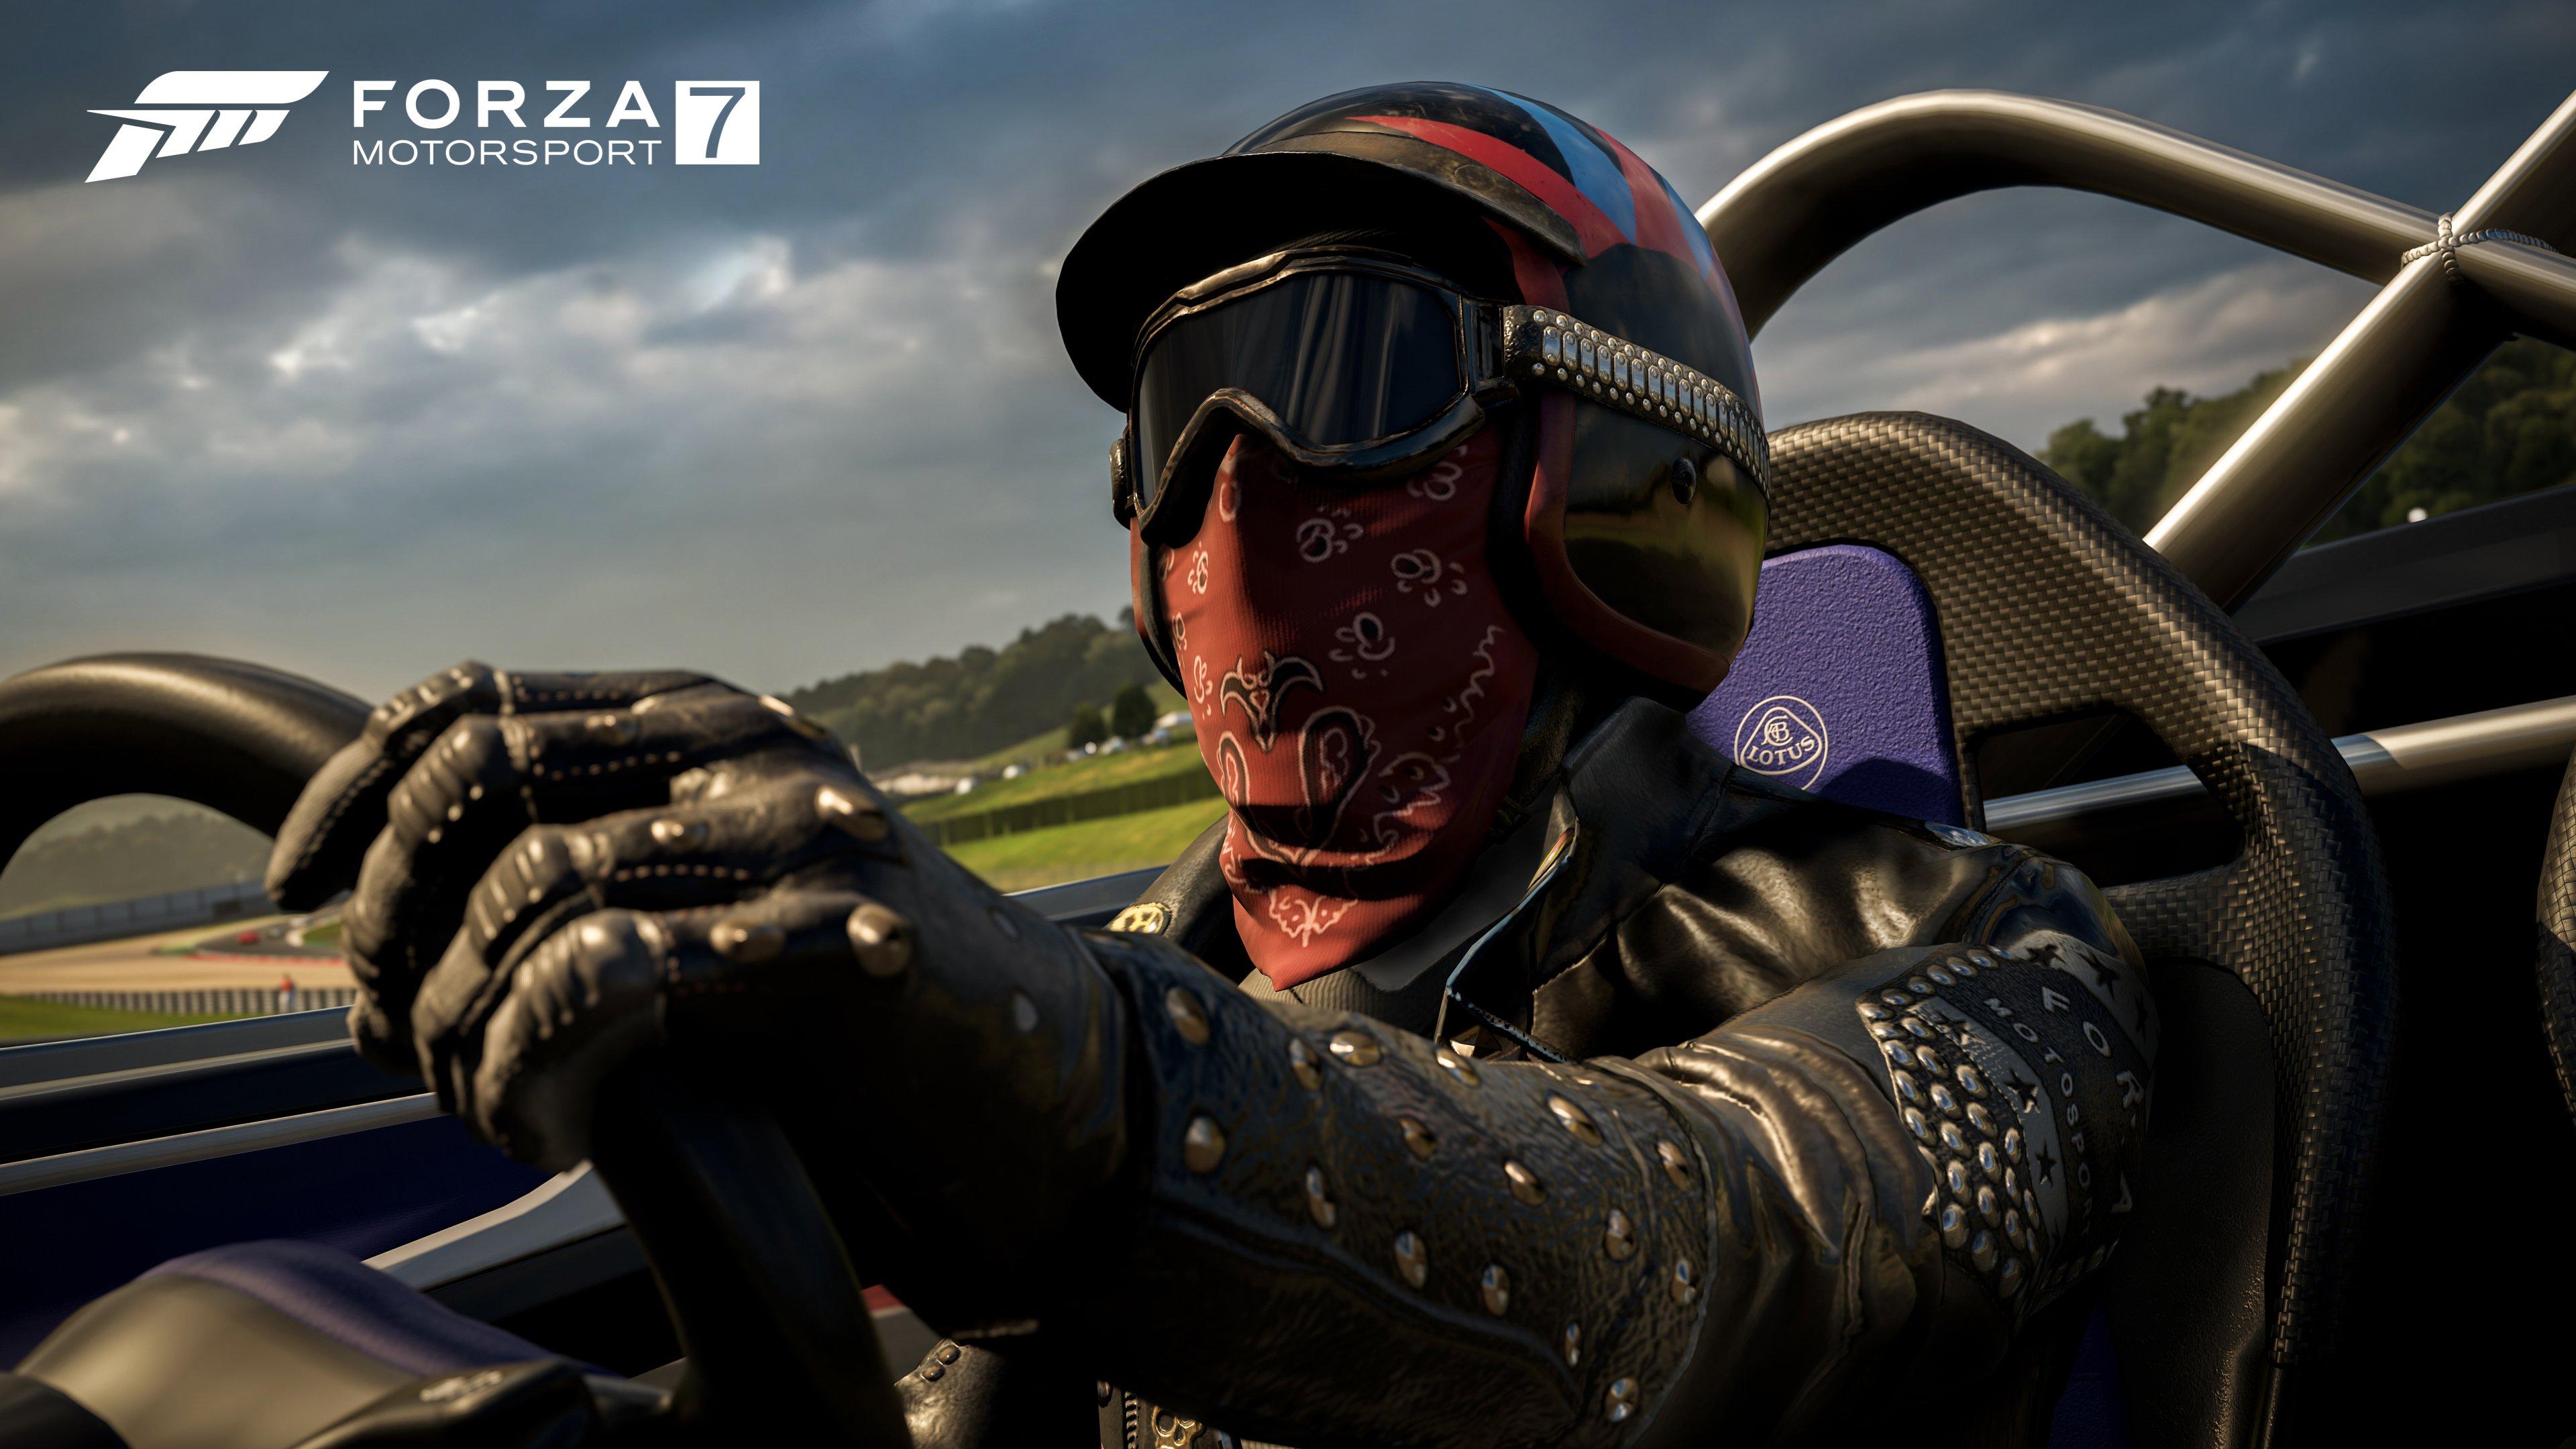 Forza7_Gamescom_PressKit_DriverCloseUp_4K1.jpg